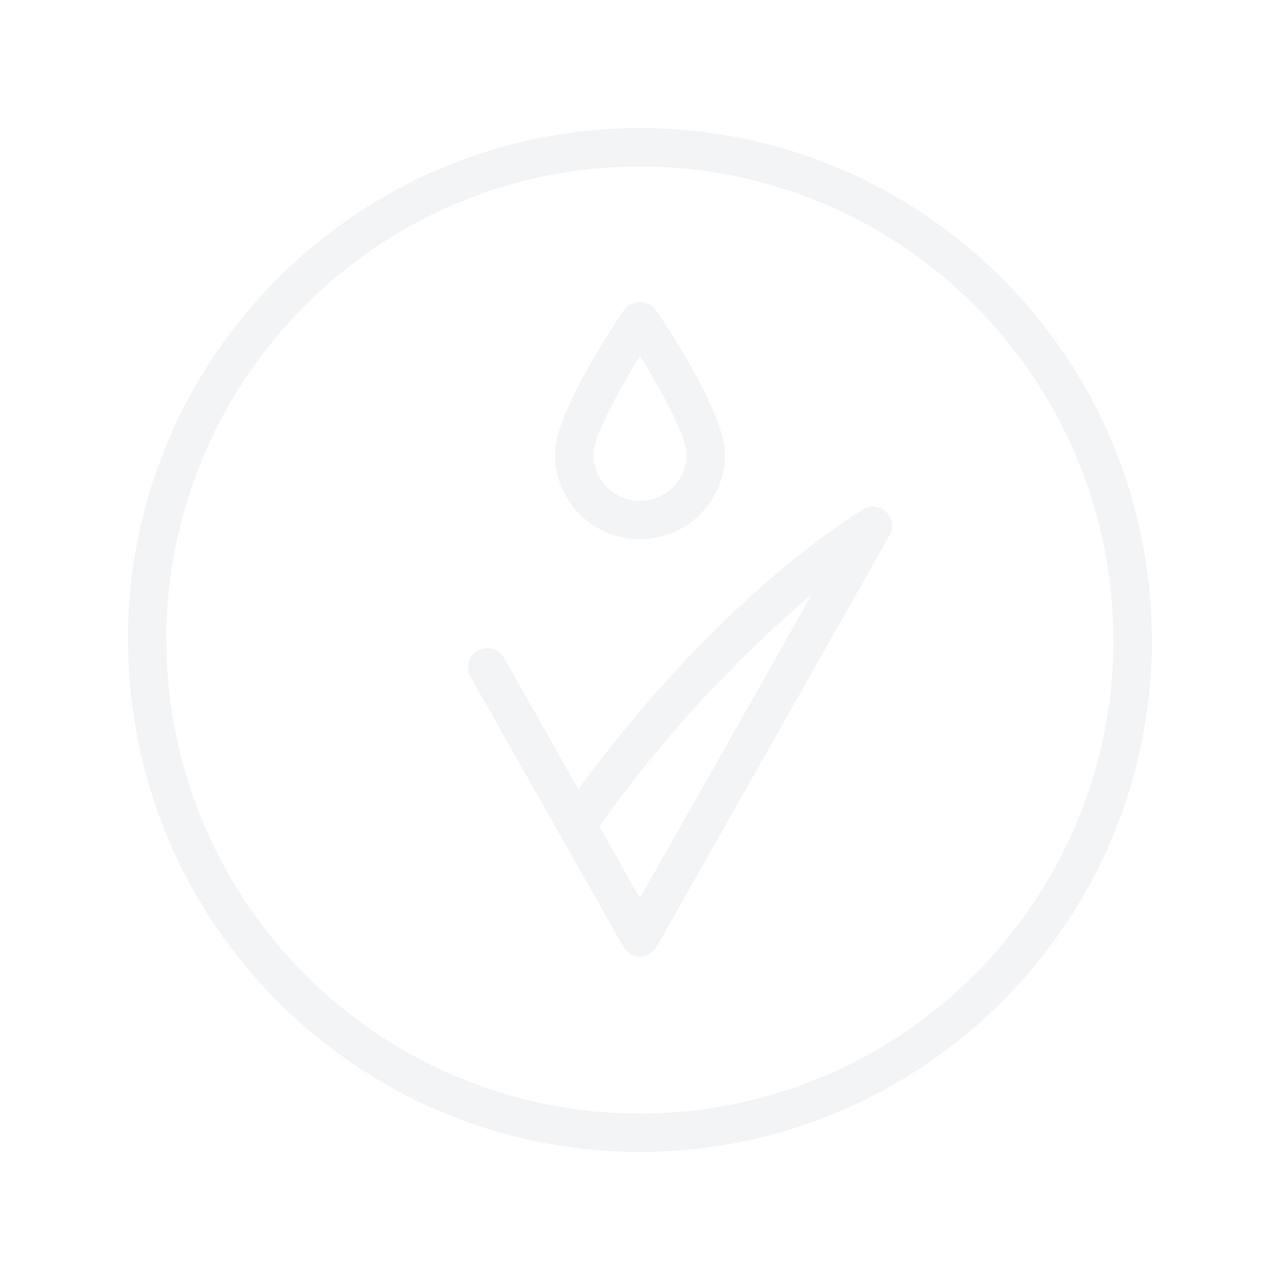 Sleek Makeup Kohl Eyeliner Pencil No.121 Black 1.66g